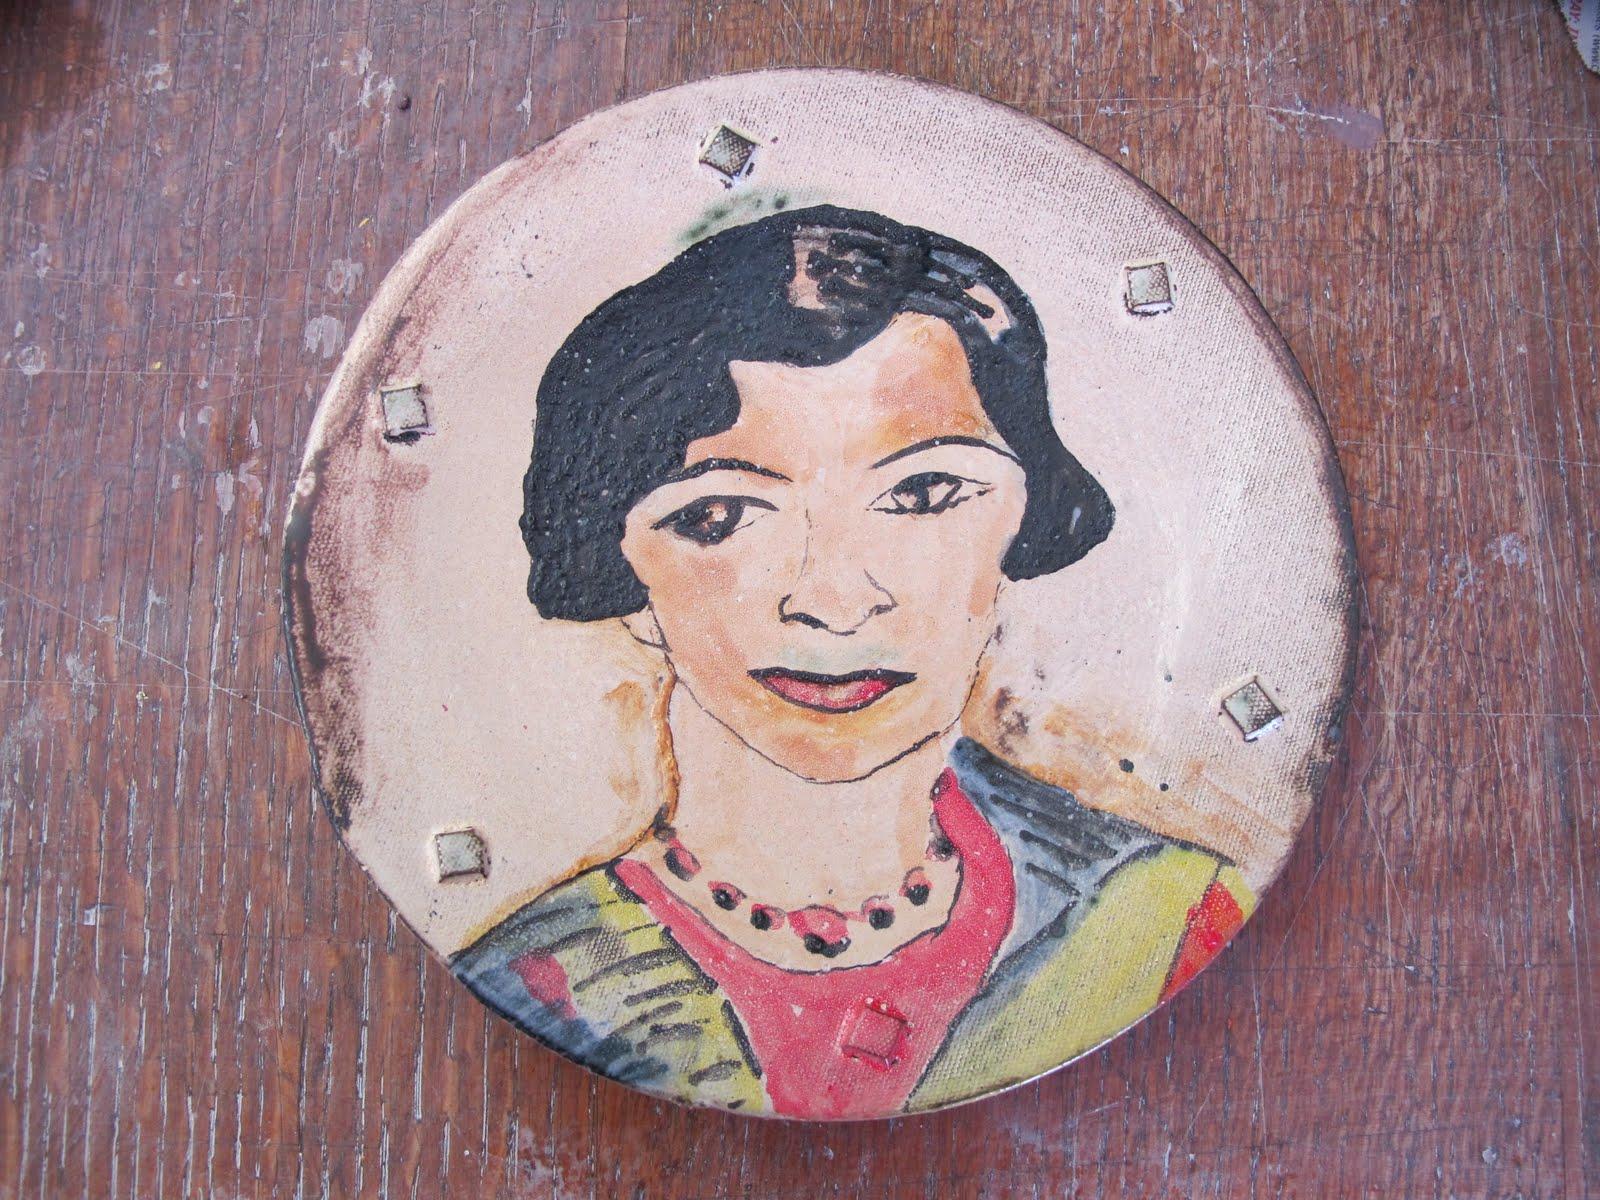 INSPIRED BY PORTRAIT OF A WOMAN BY IRMA STERN - MAJOLICA GLAZE